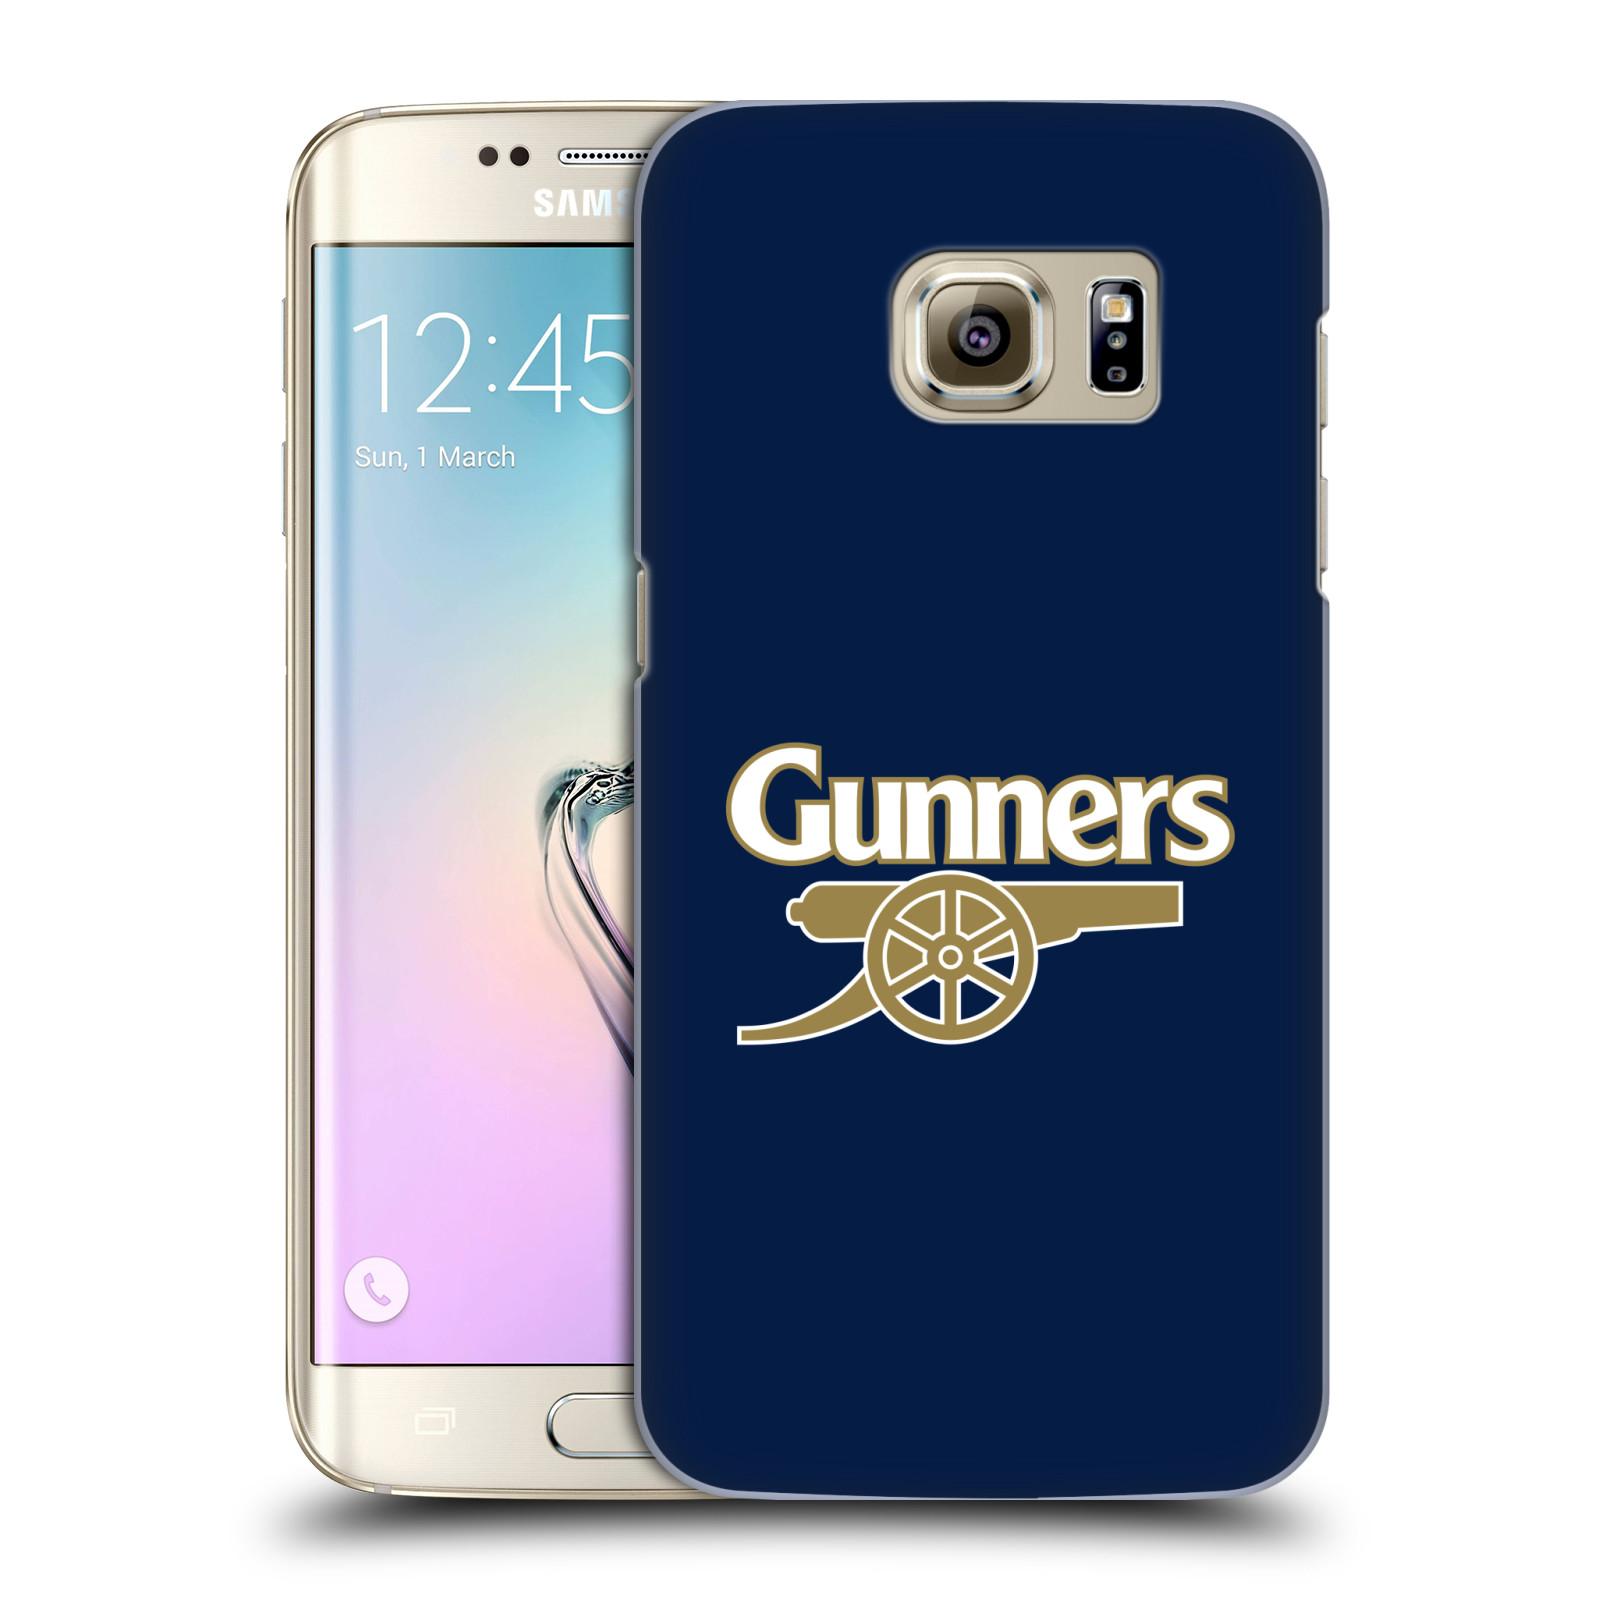 Plastové pouzdro na mobil Samsung Galaxy S7 Edge - Head Case - Arsenal FC - Gunners